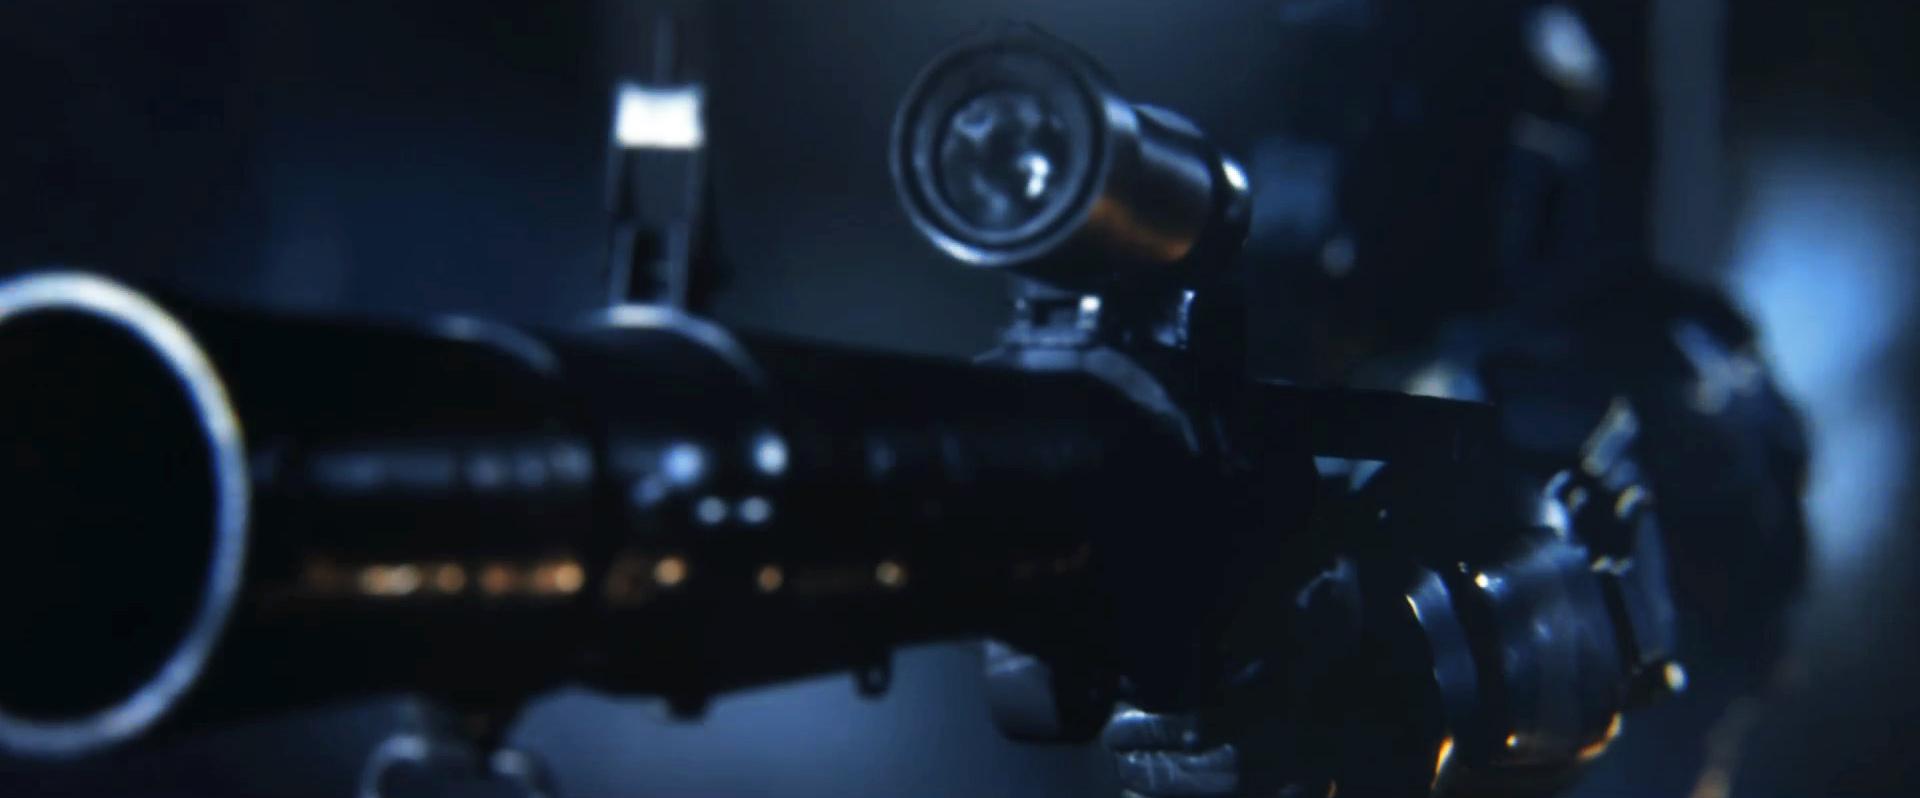 amazingly-cool-sci-fi-short-film-azarkant-10.jpg